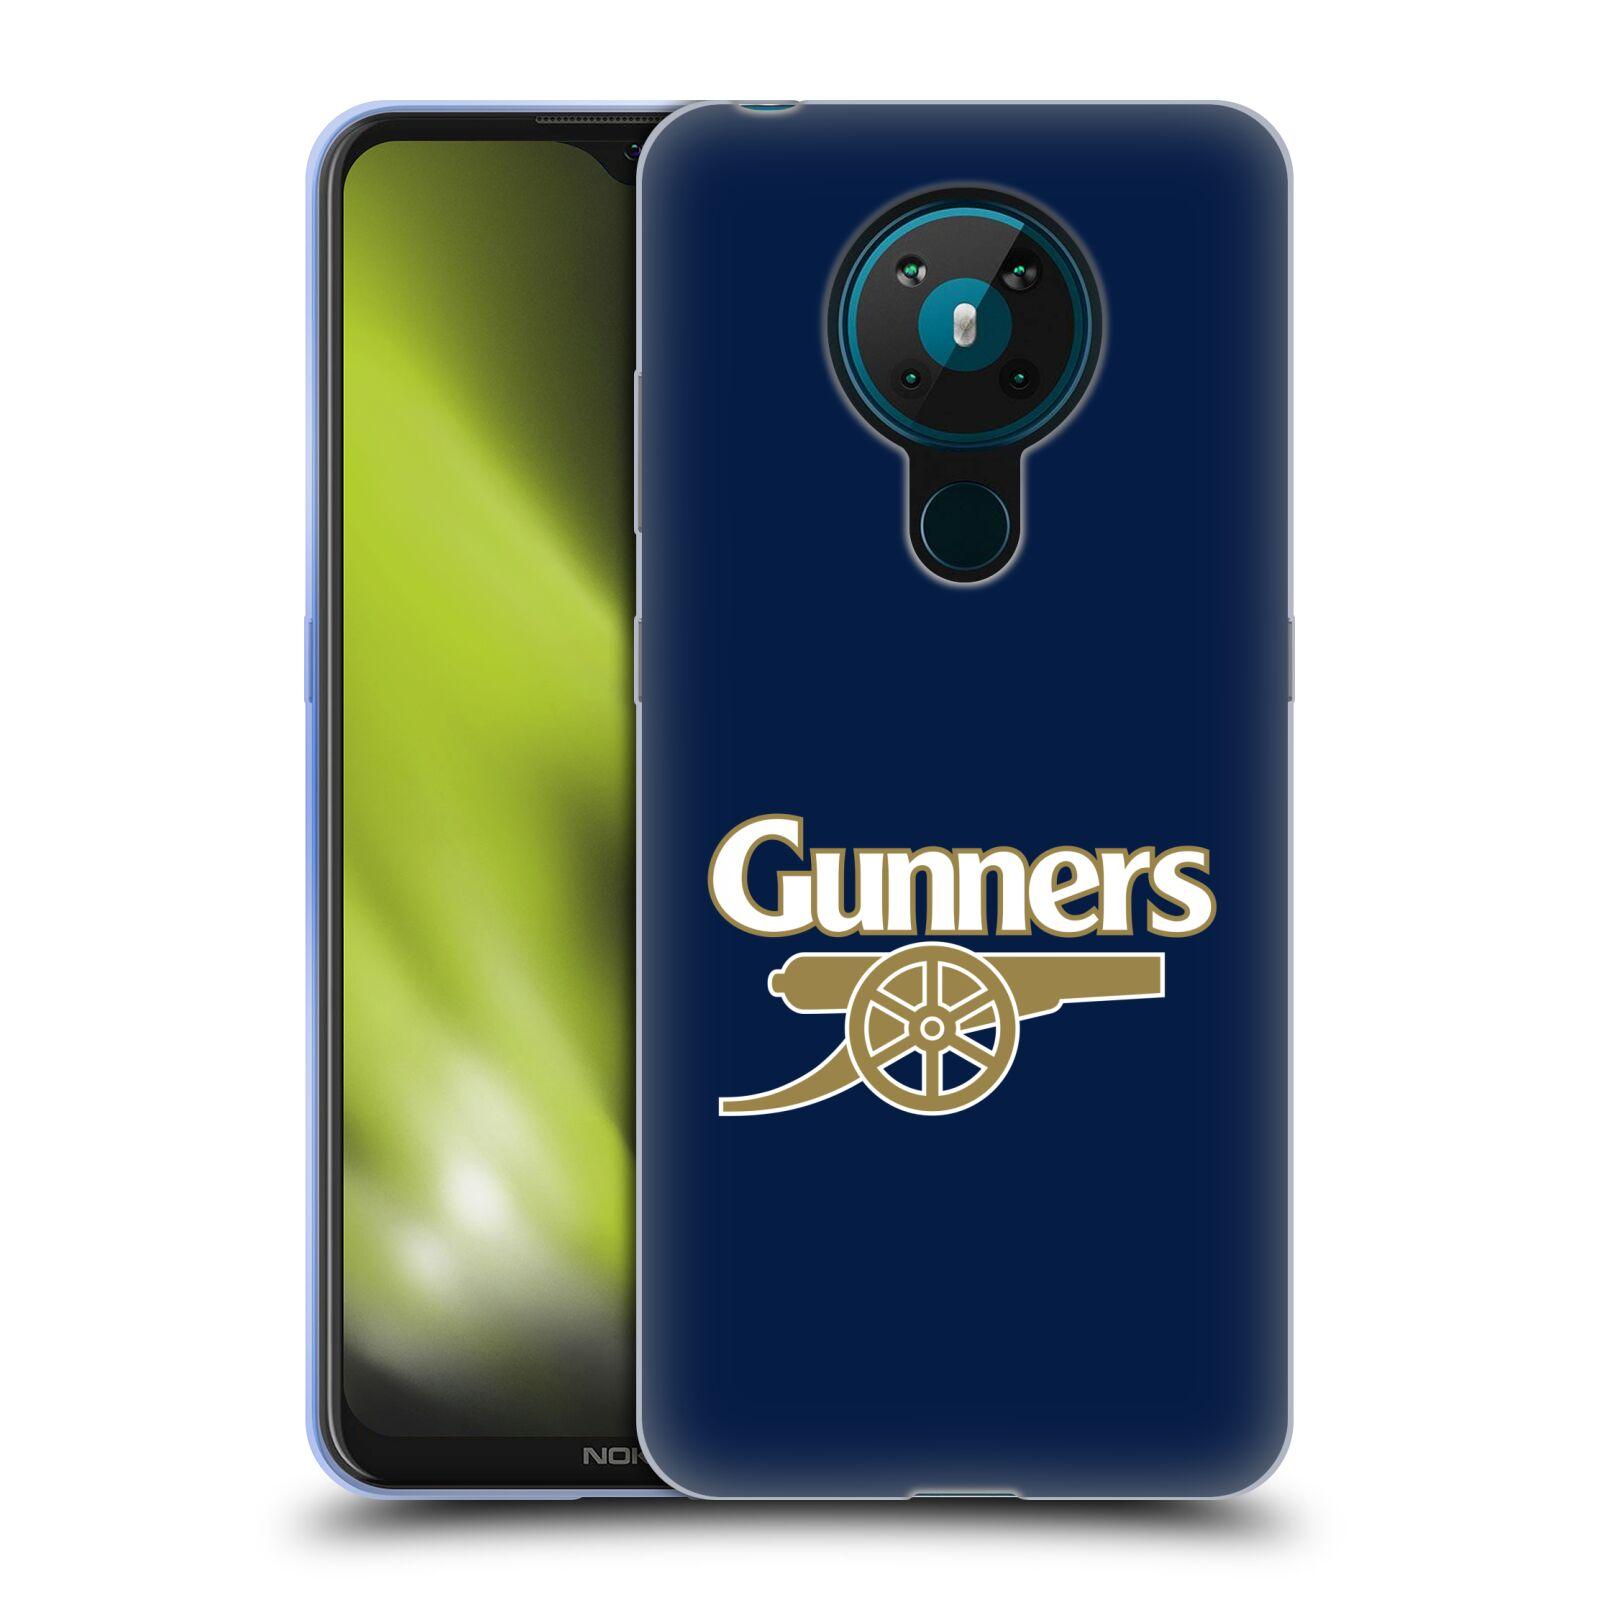 Silikonové pouzdro na mobil Nokia 5.3 - Head Case - Arsenal FC - Gunners